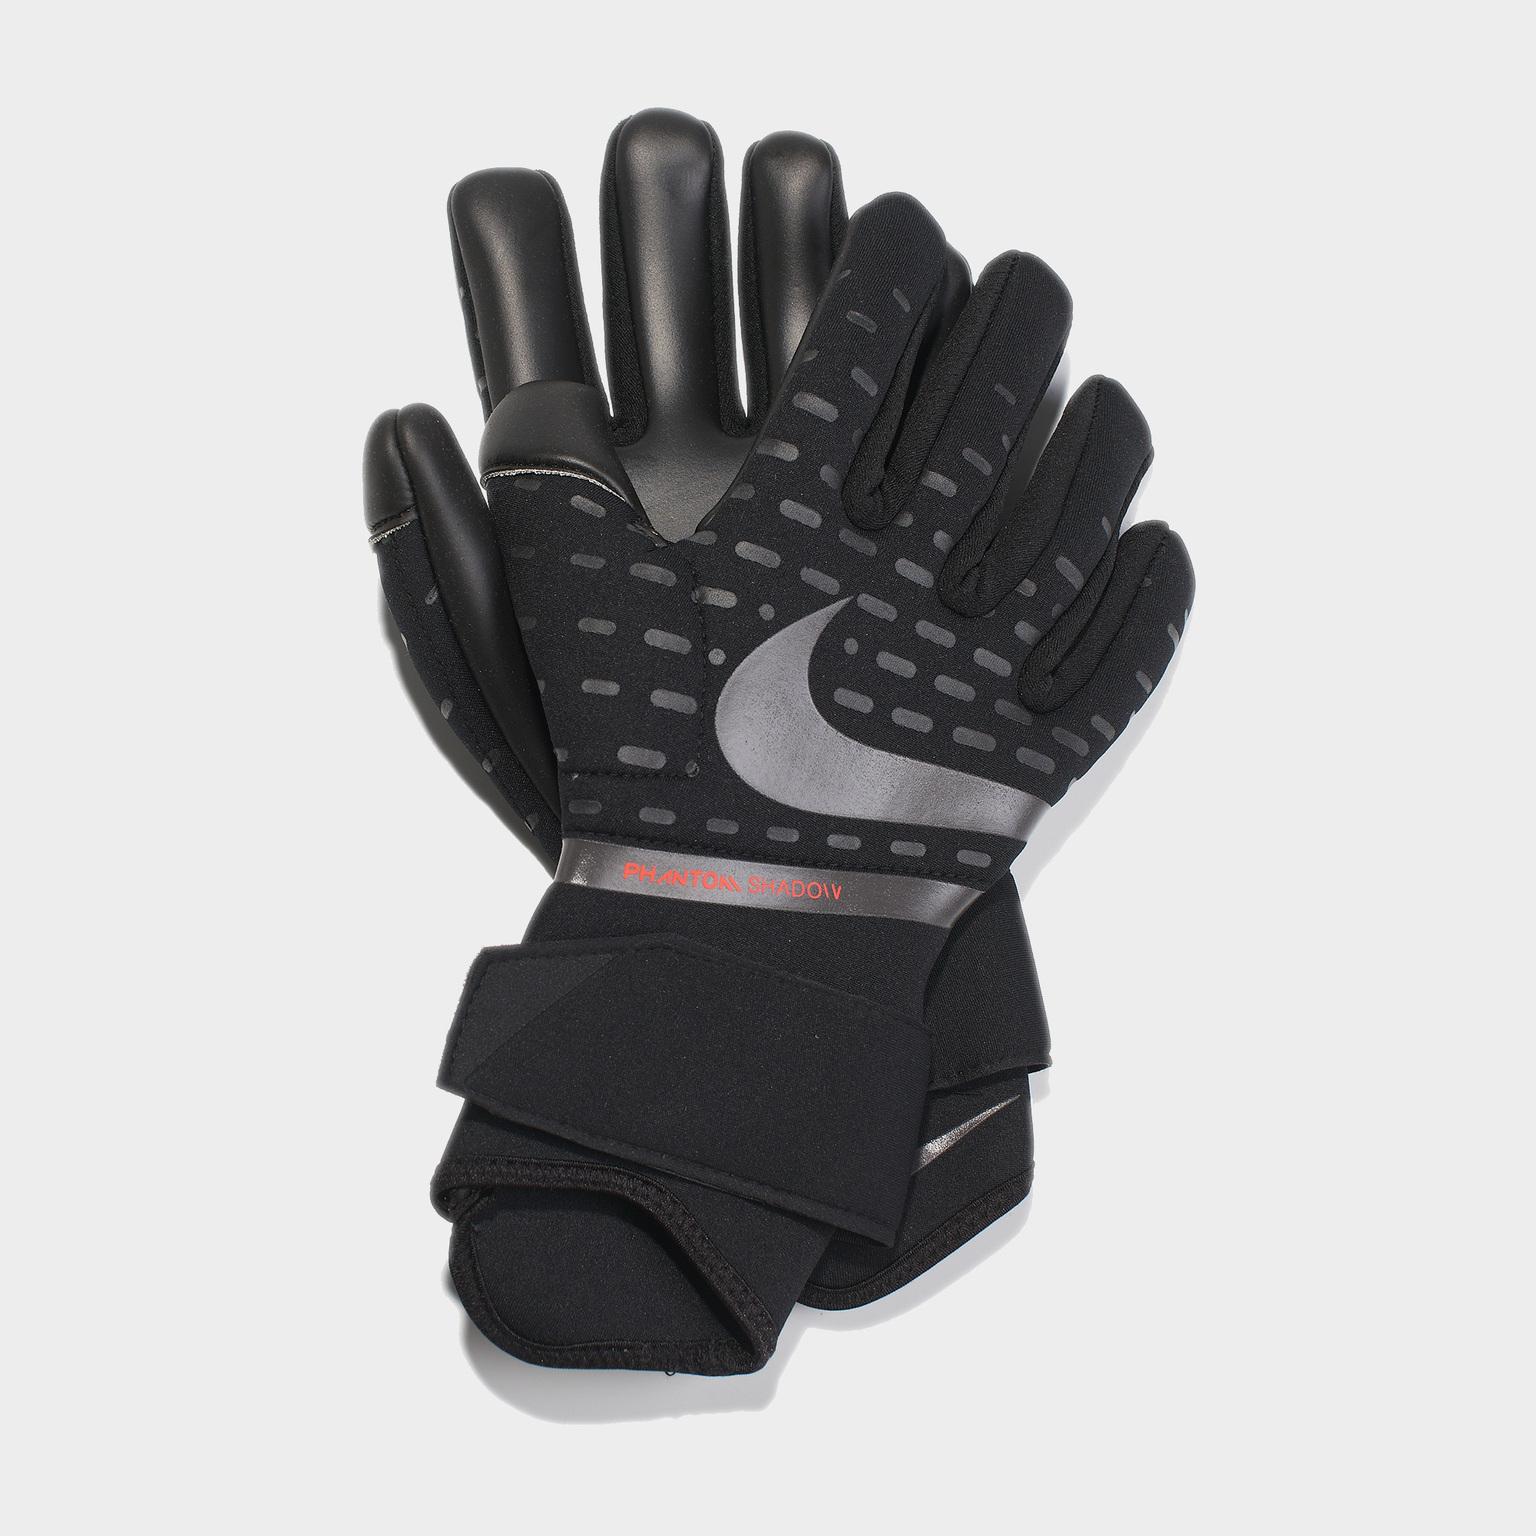 Перчатки вратарские Nike Phantom Shadow CN6758-011 перчатки вратарские nike vapor grip 3 cn5650 011